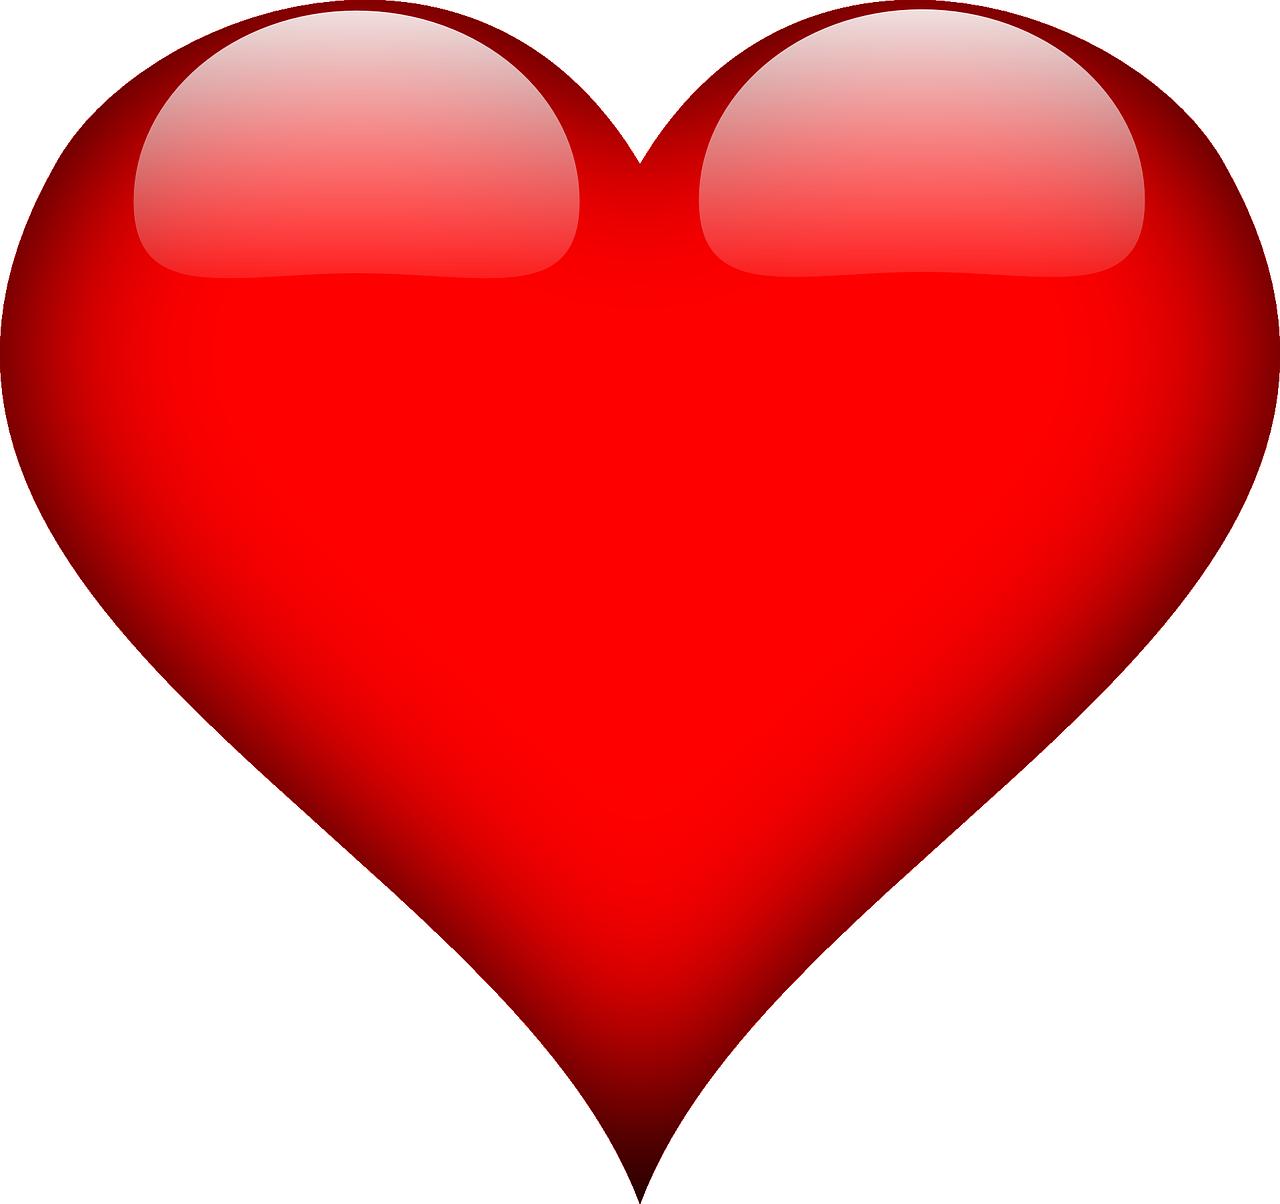 Free Image on Pixabay Heart, Love, Red, Valentine